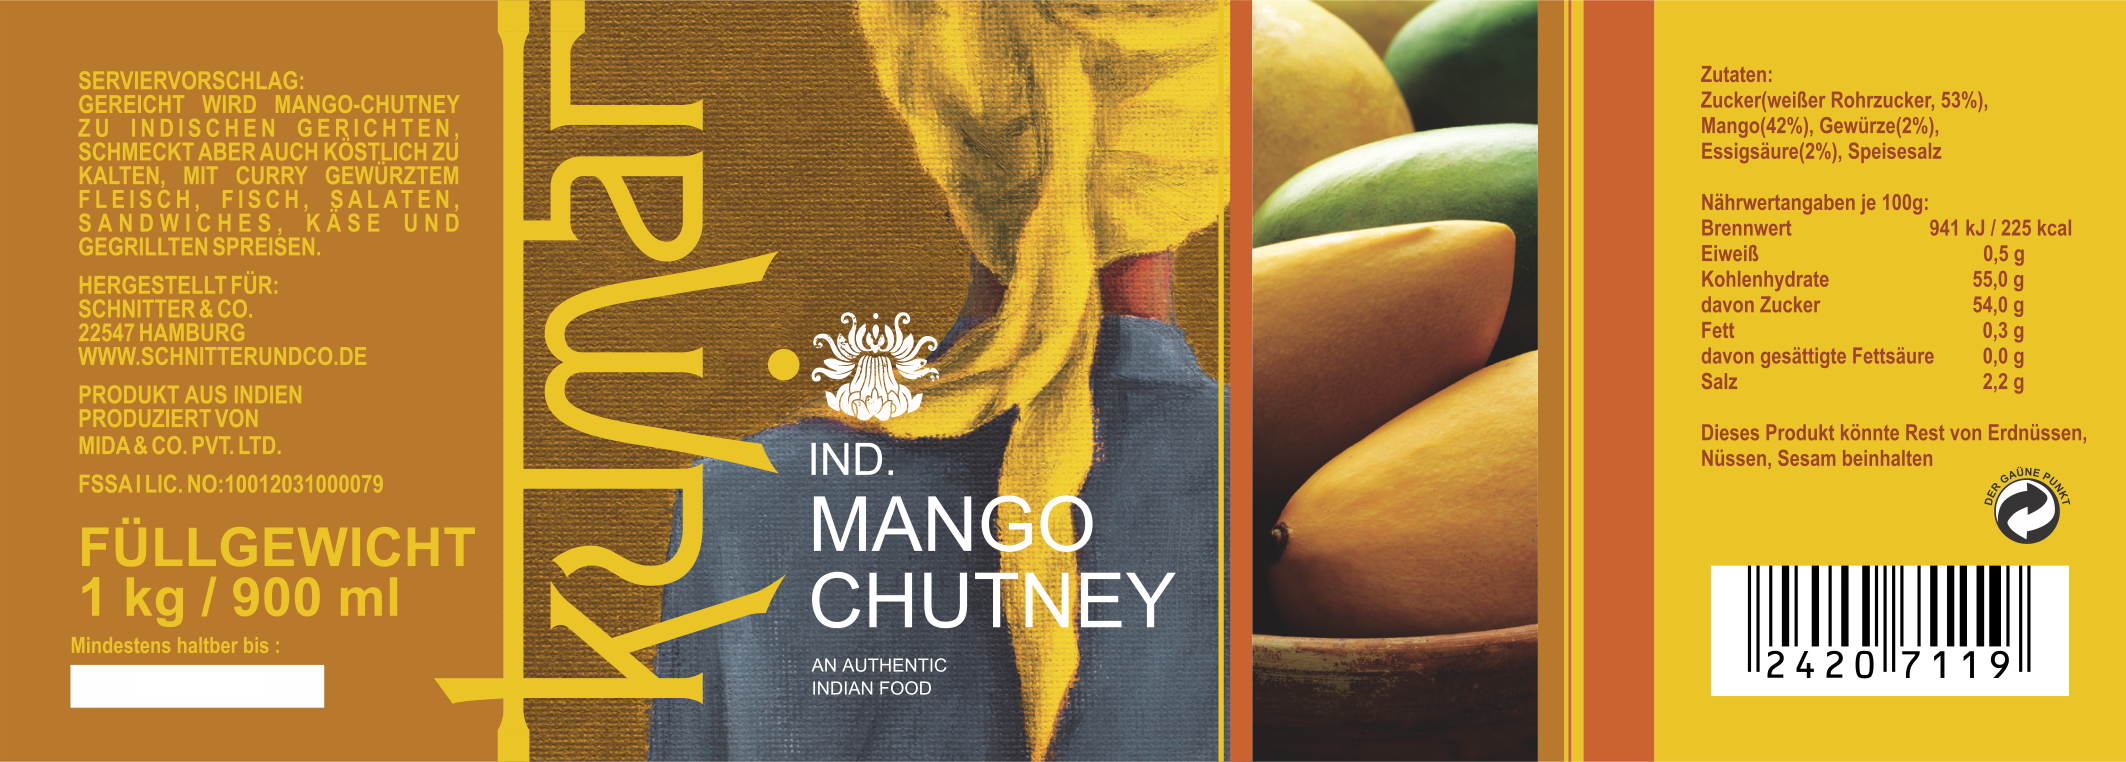 Kumar Mango Chutney Label (1 Kg)